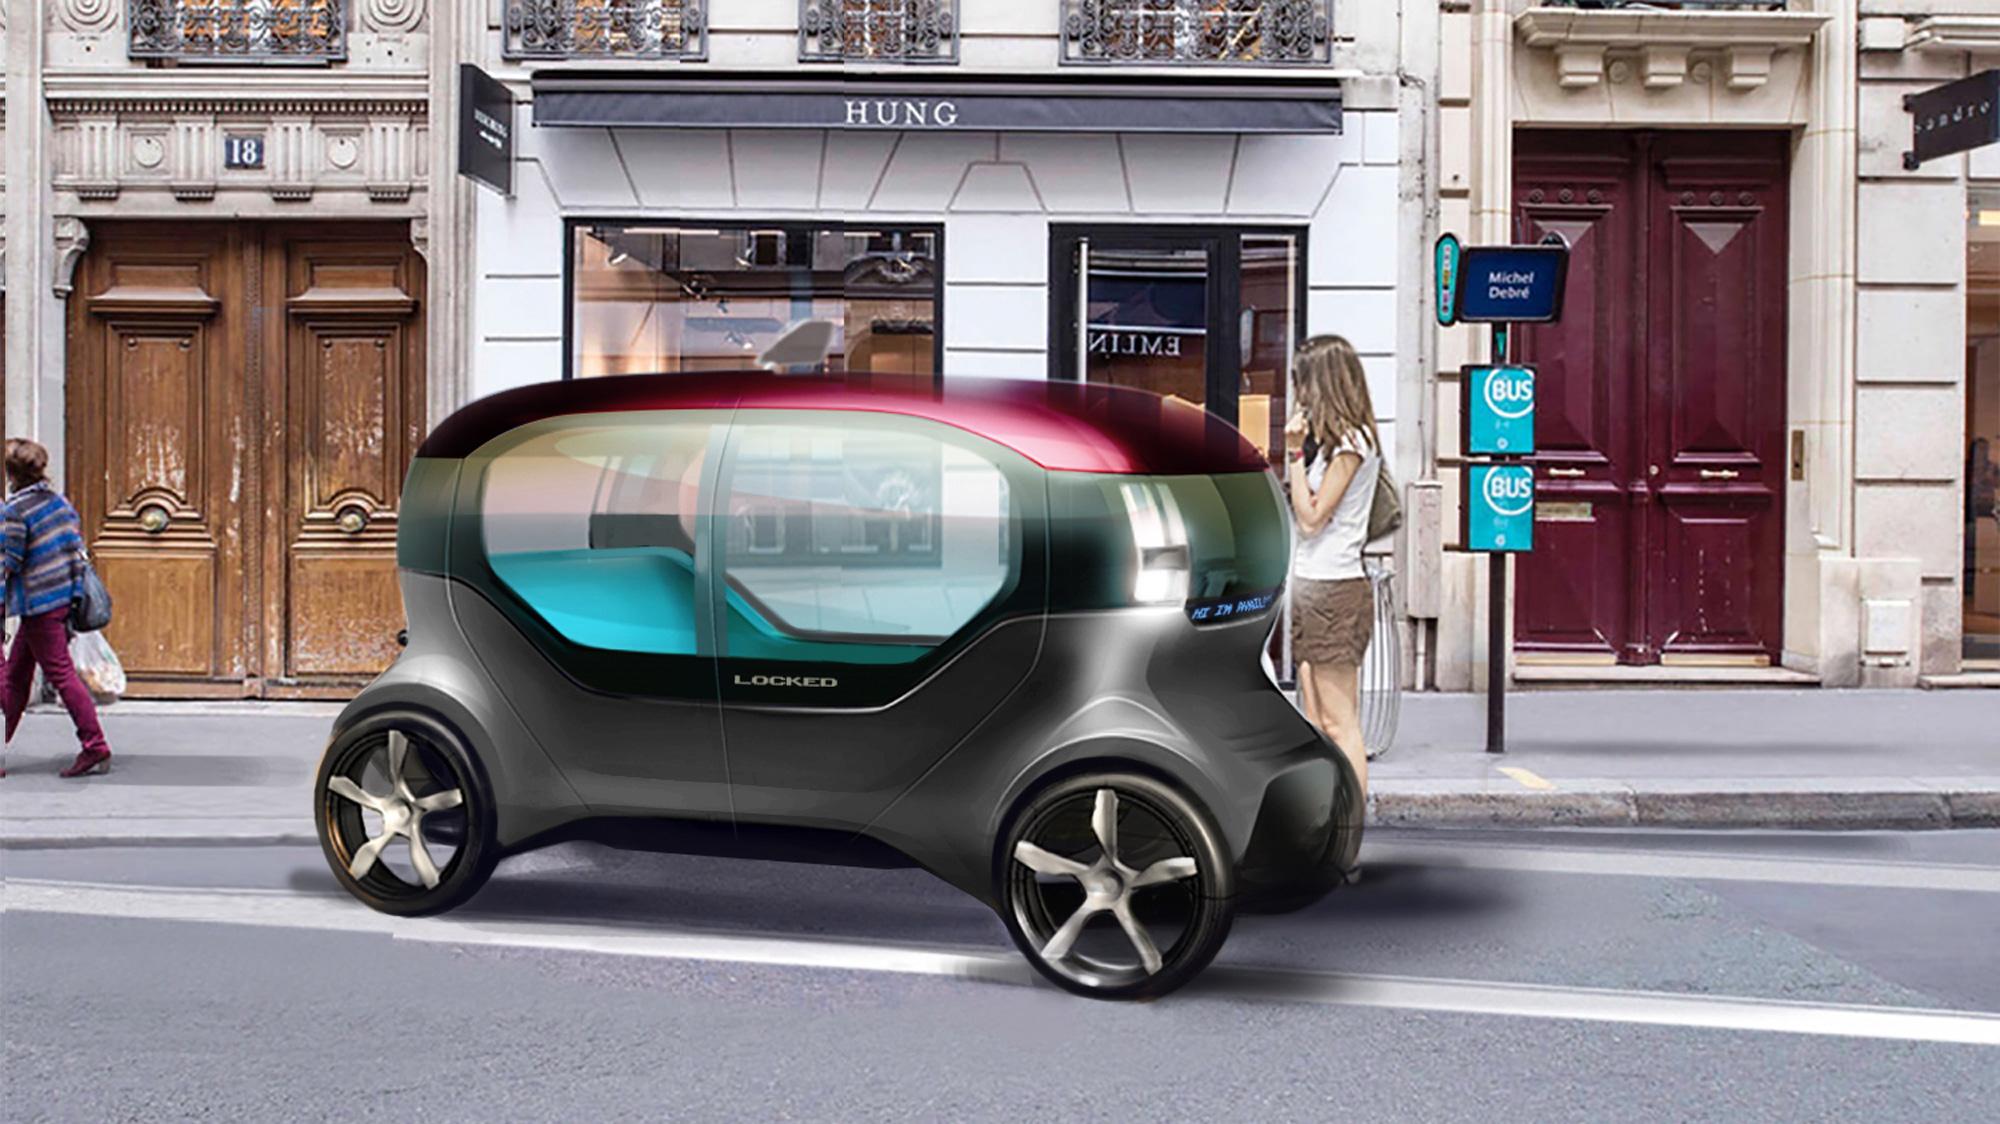 Iugo - A shared inner city vehicle